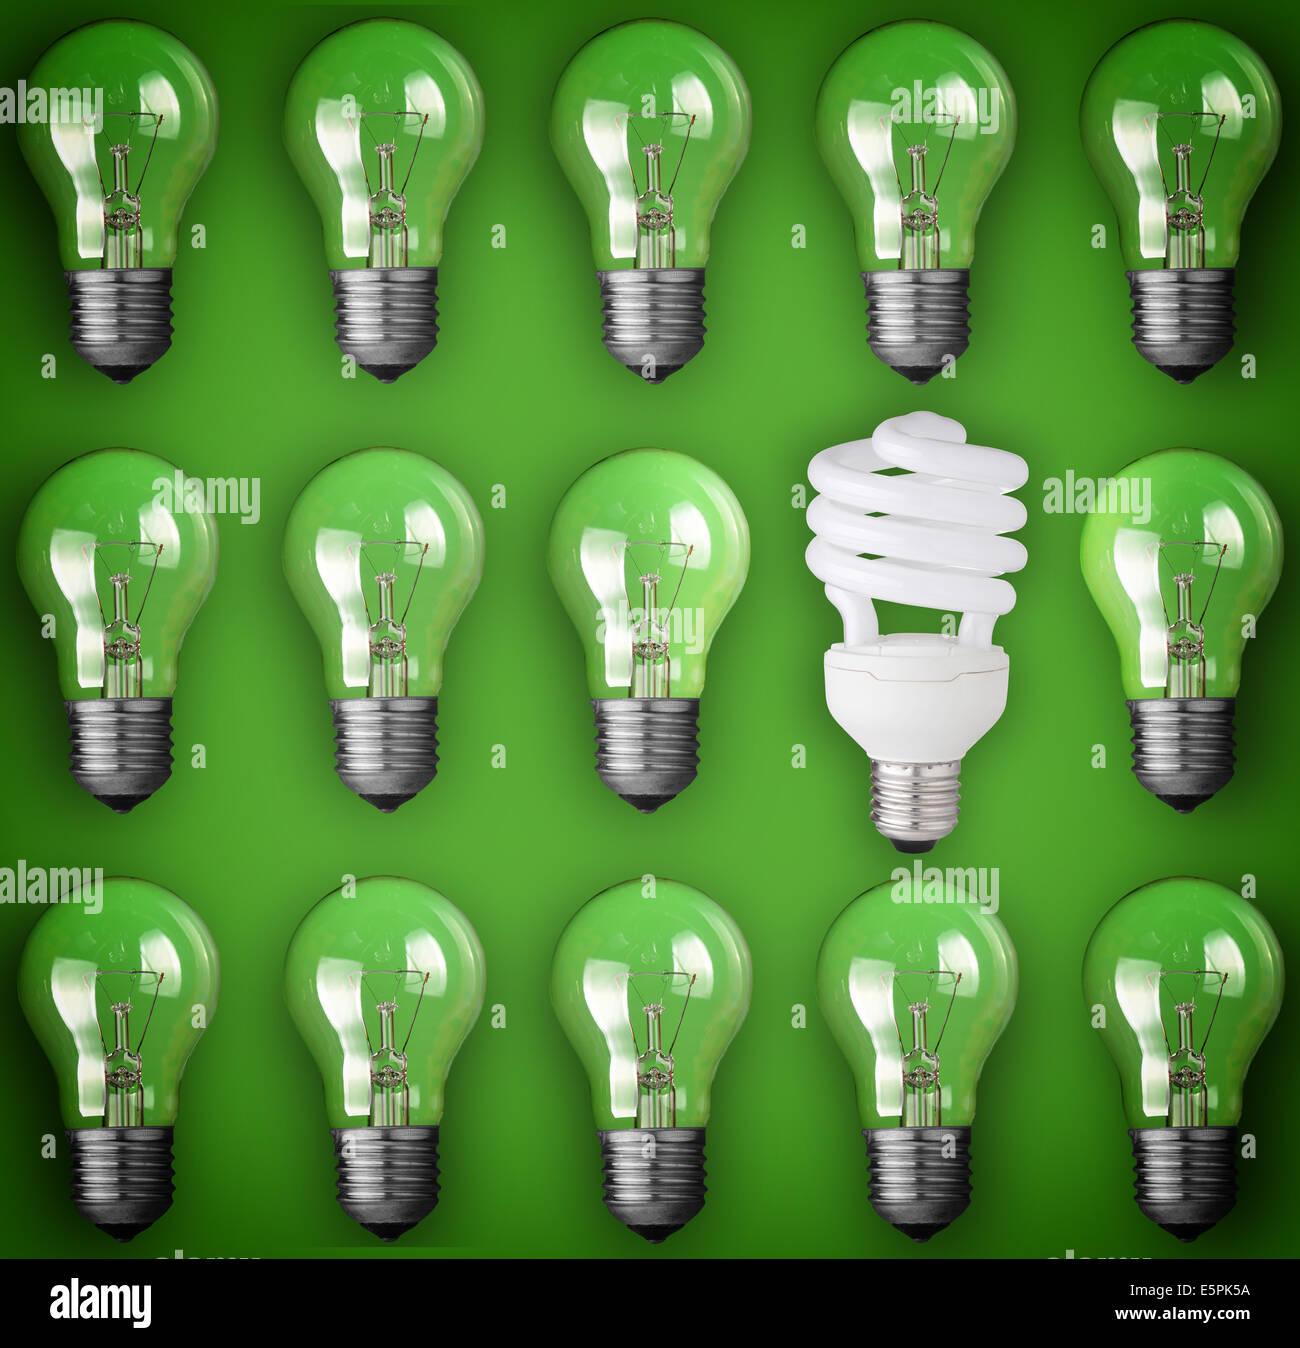 Idee-Konzept-Glühbirne Stockbild